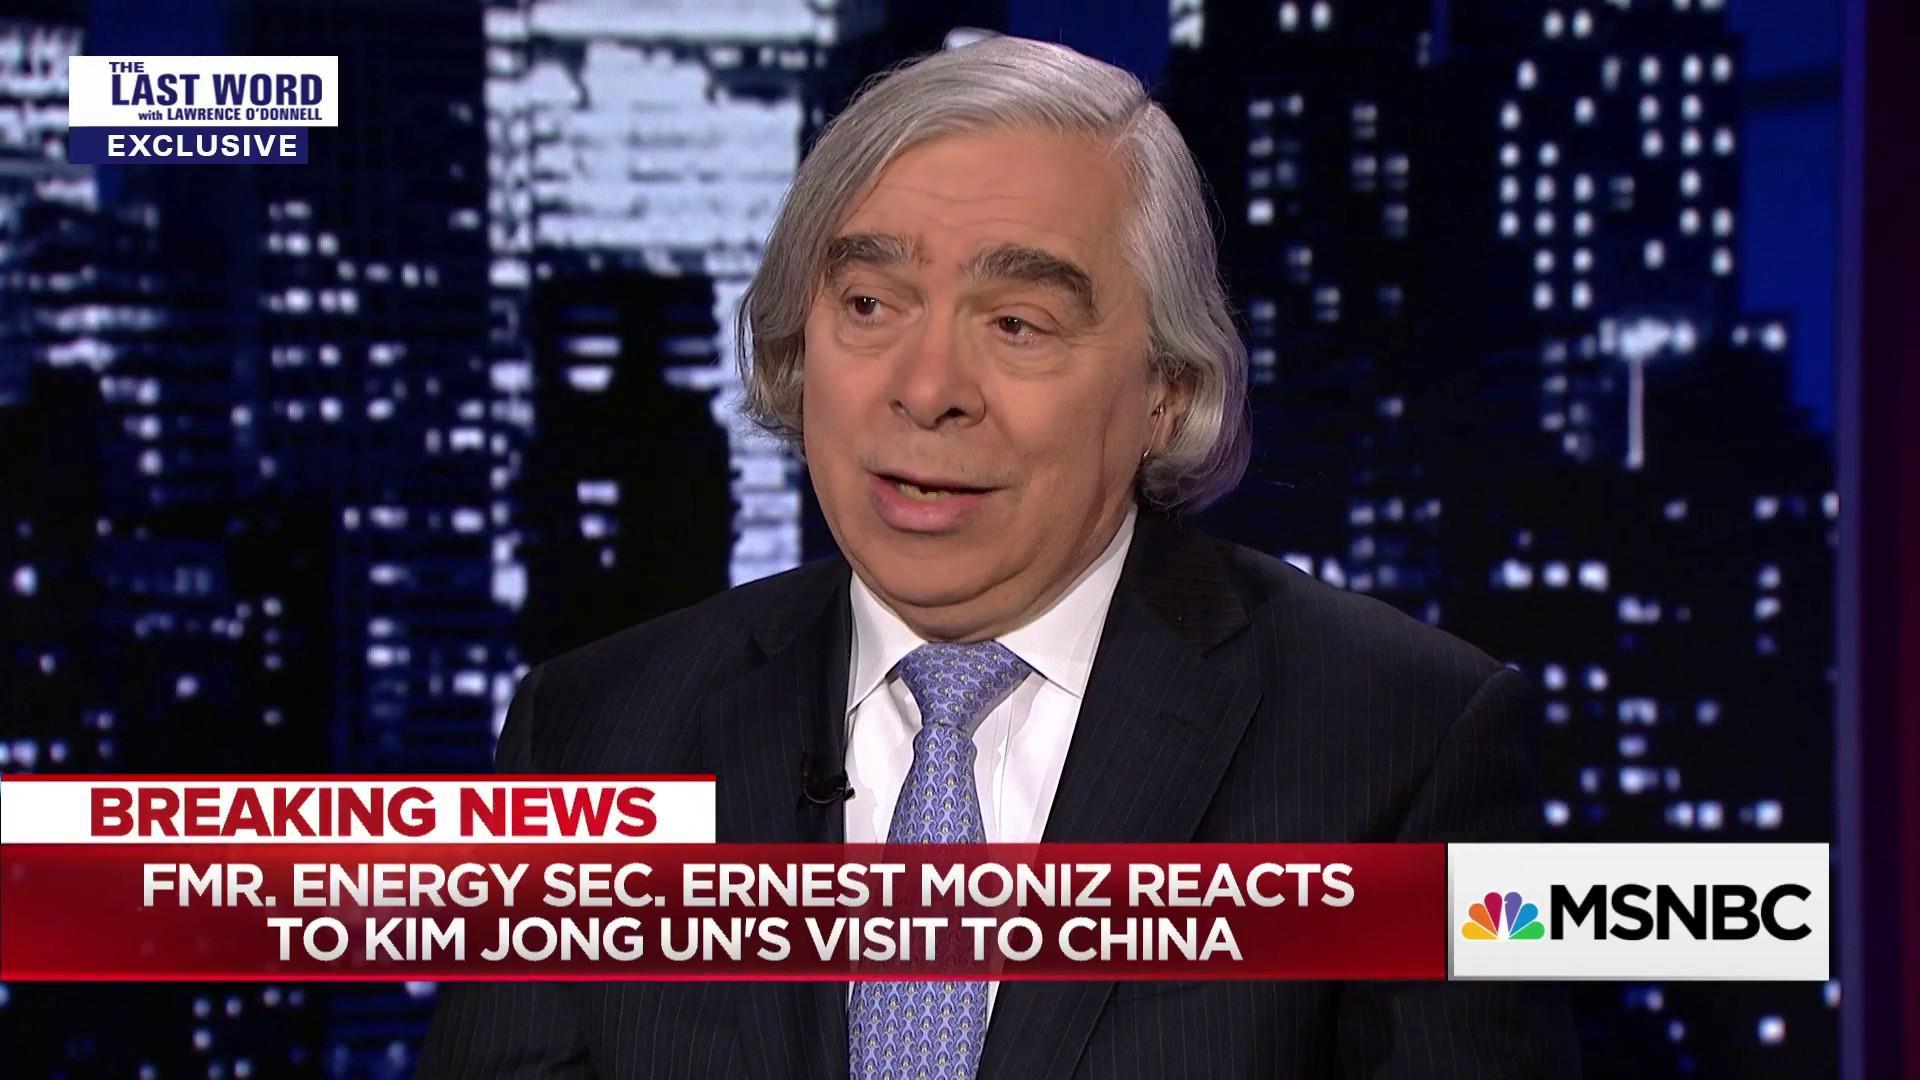 Obama Energy Sec. Moniz reacts to North Korea-China meeting